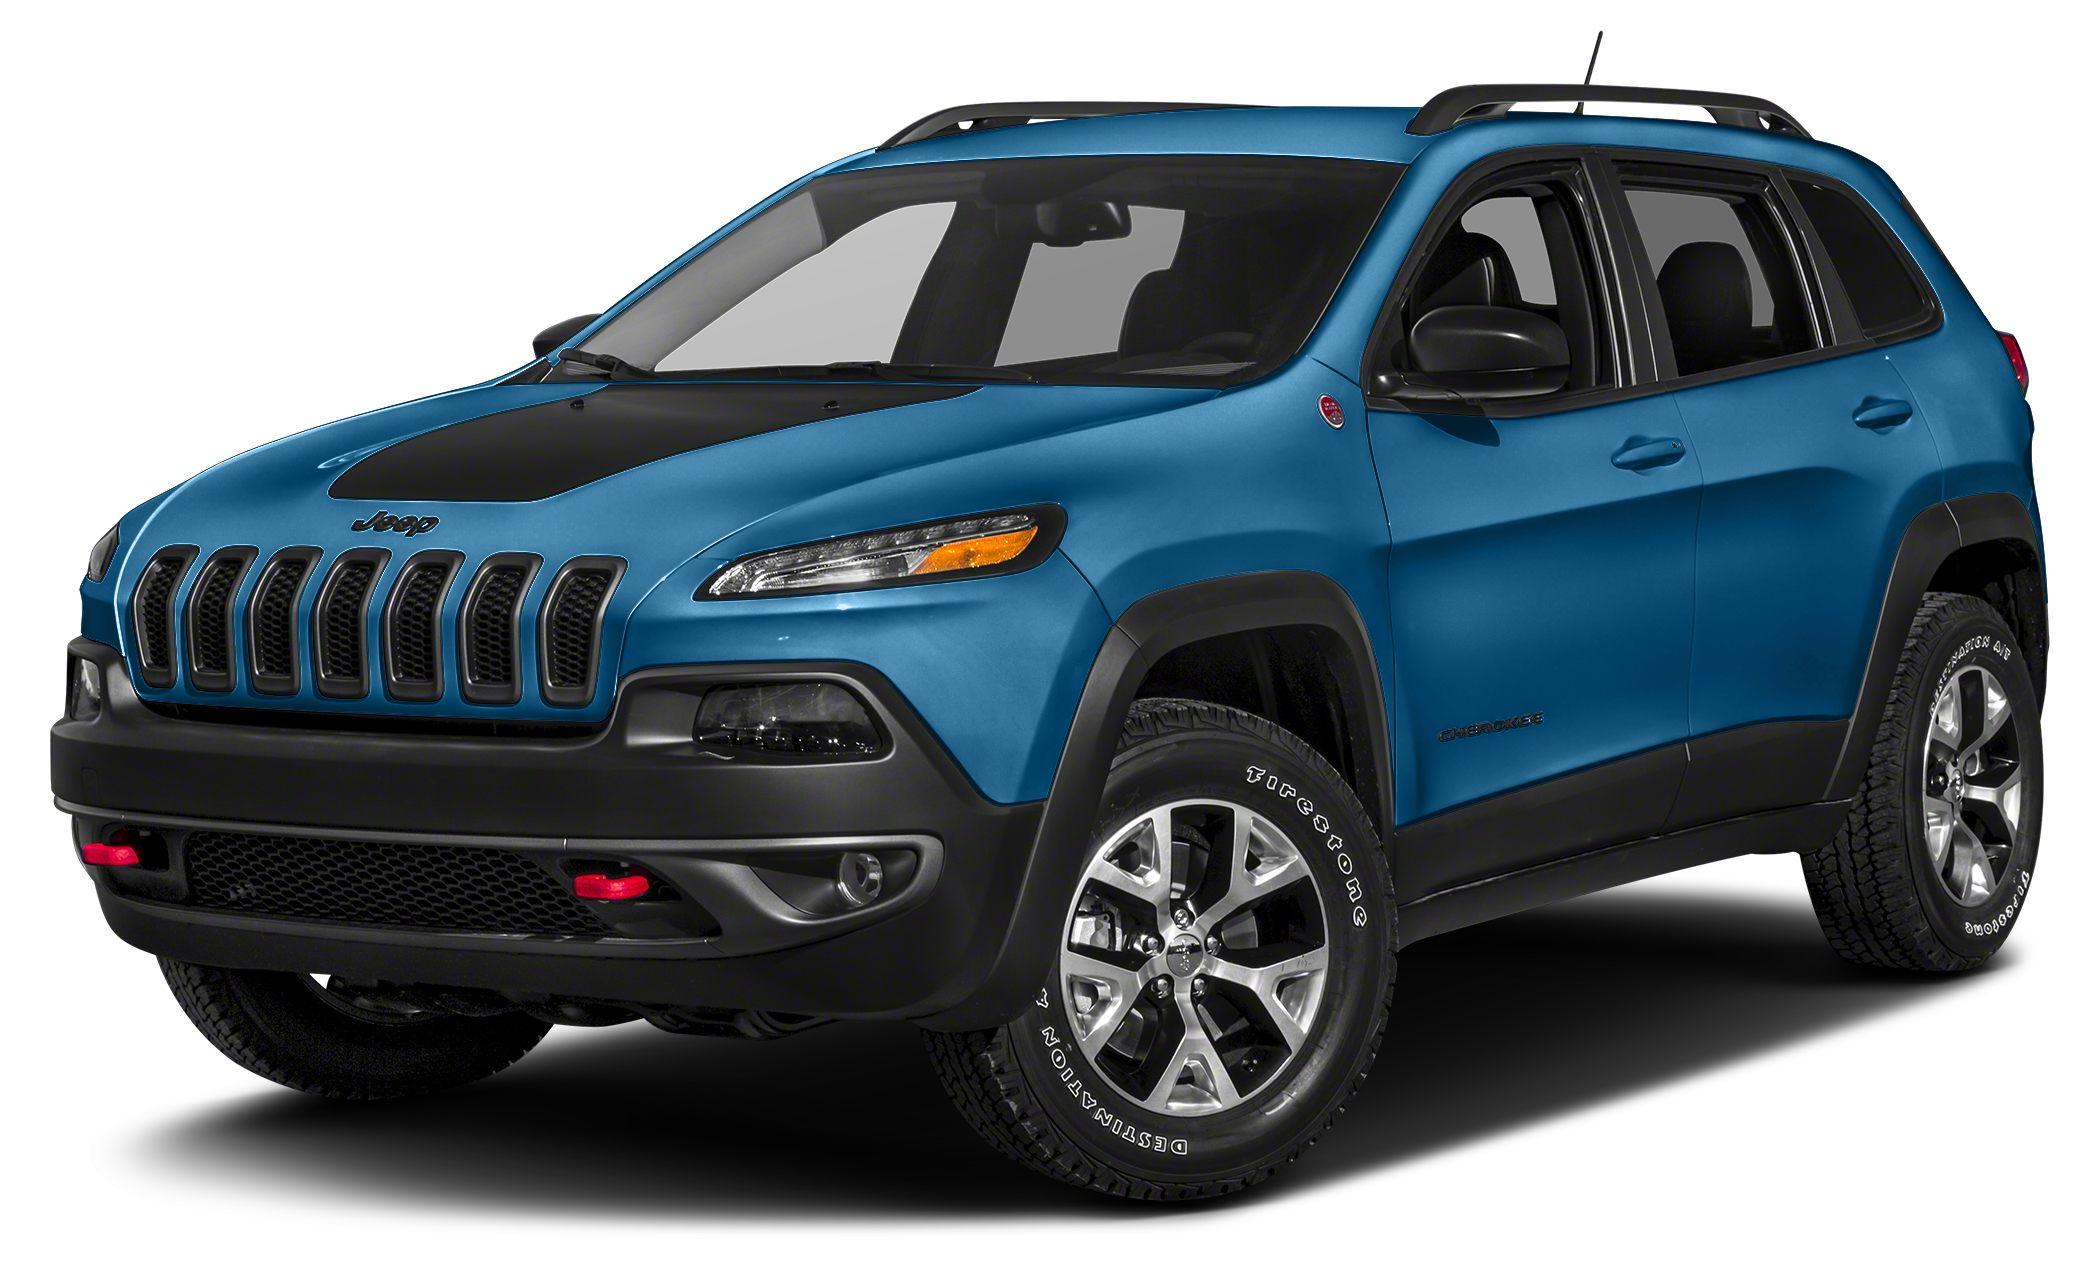 2018 Jeep Cherokee Trailhawk Miles 13Color Hydro Blue Stock 18CK134 VIN 1C4PJMBX5JD532626